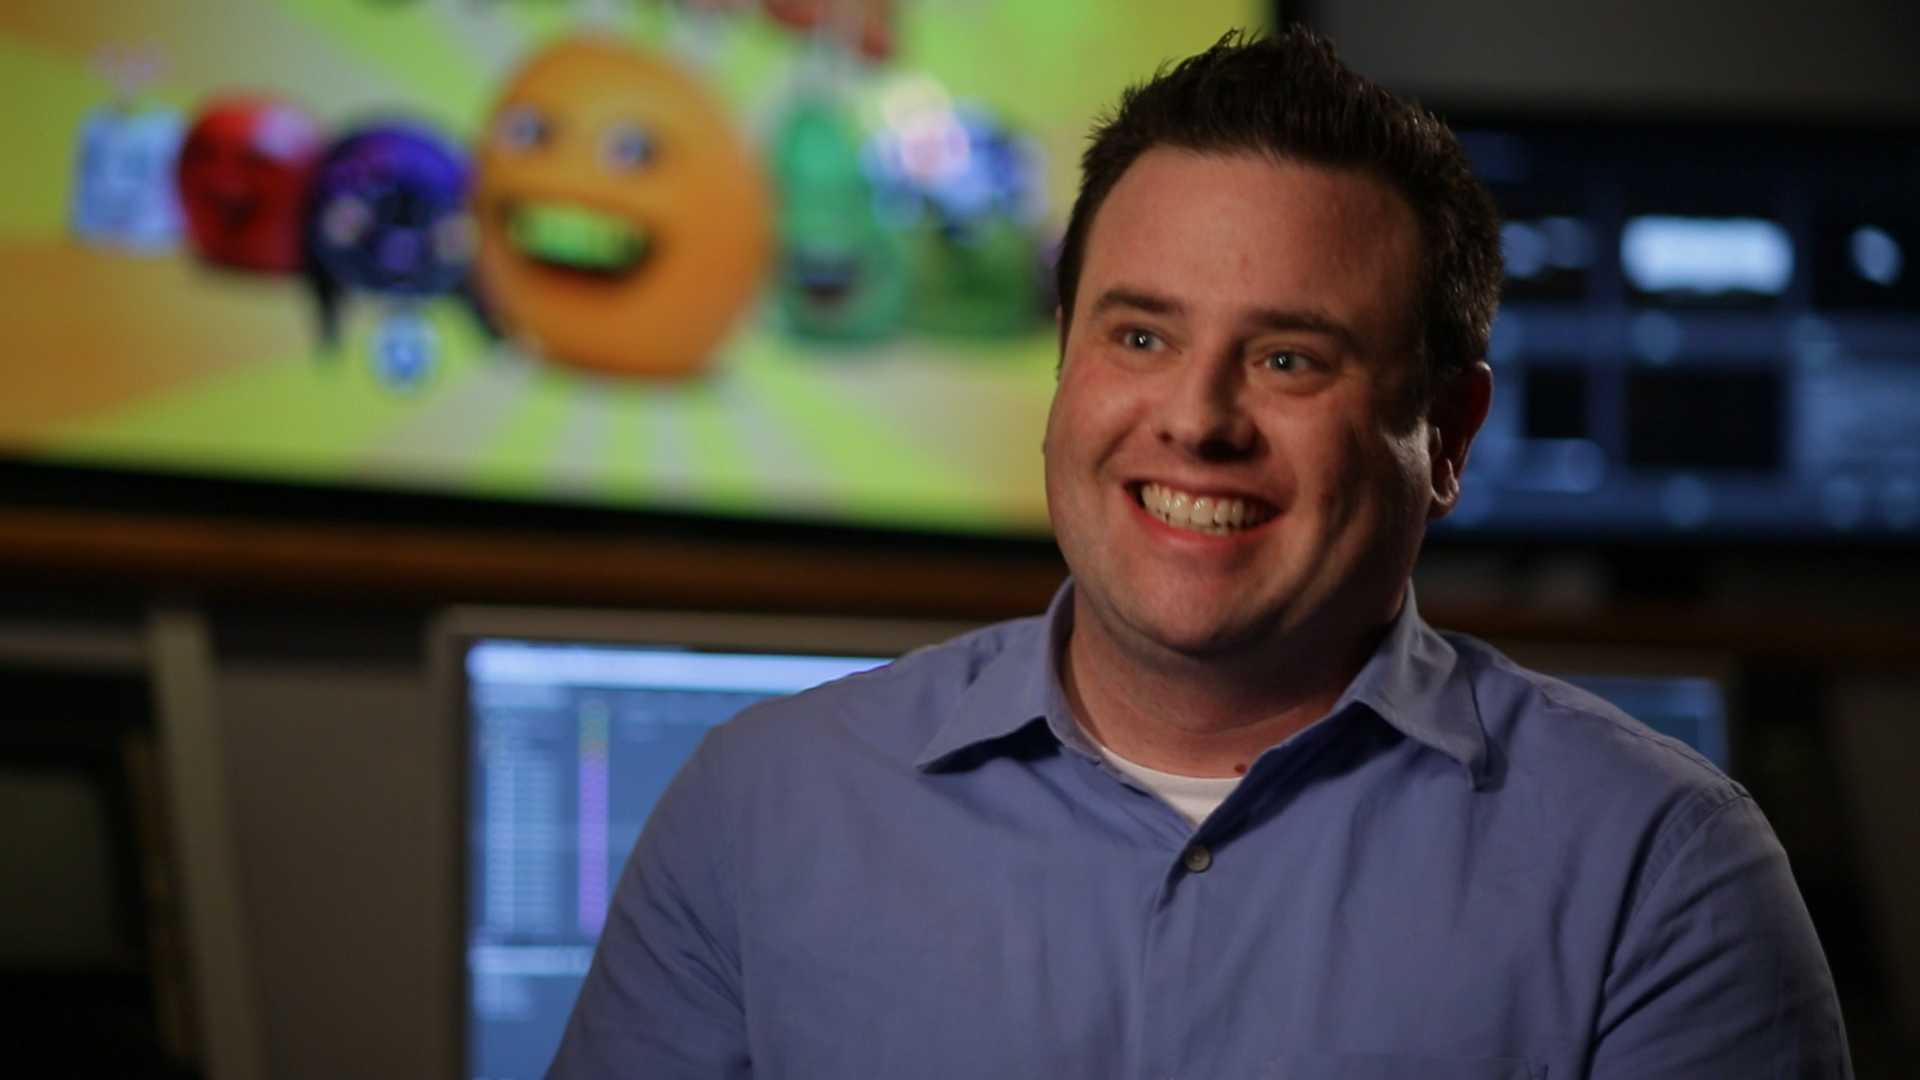 Kappa Studios switches to Adobe workflow to create Cartoon Network's Annoying Orange series 11